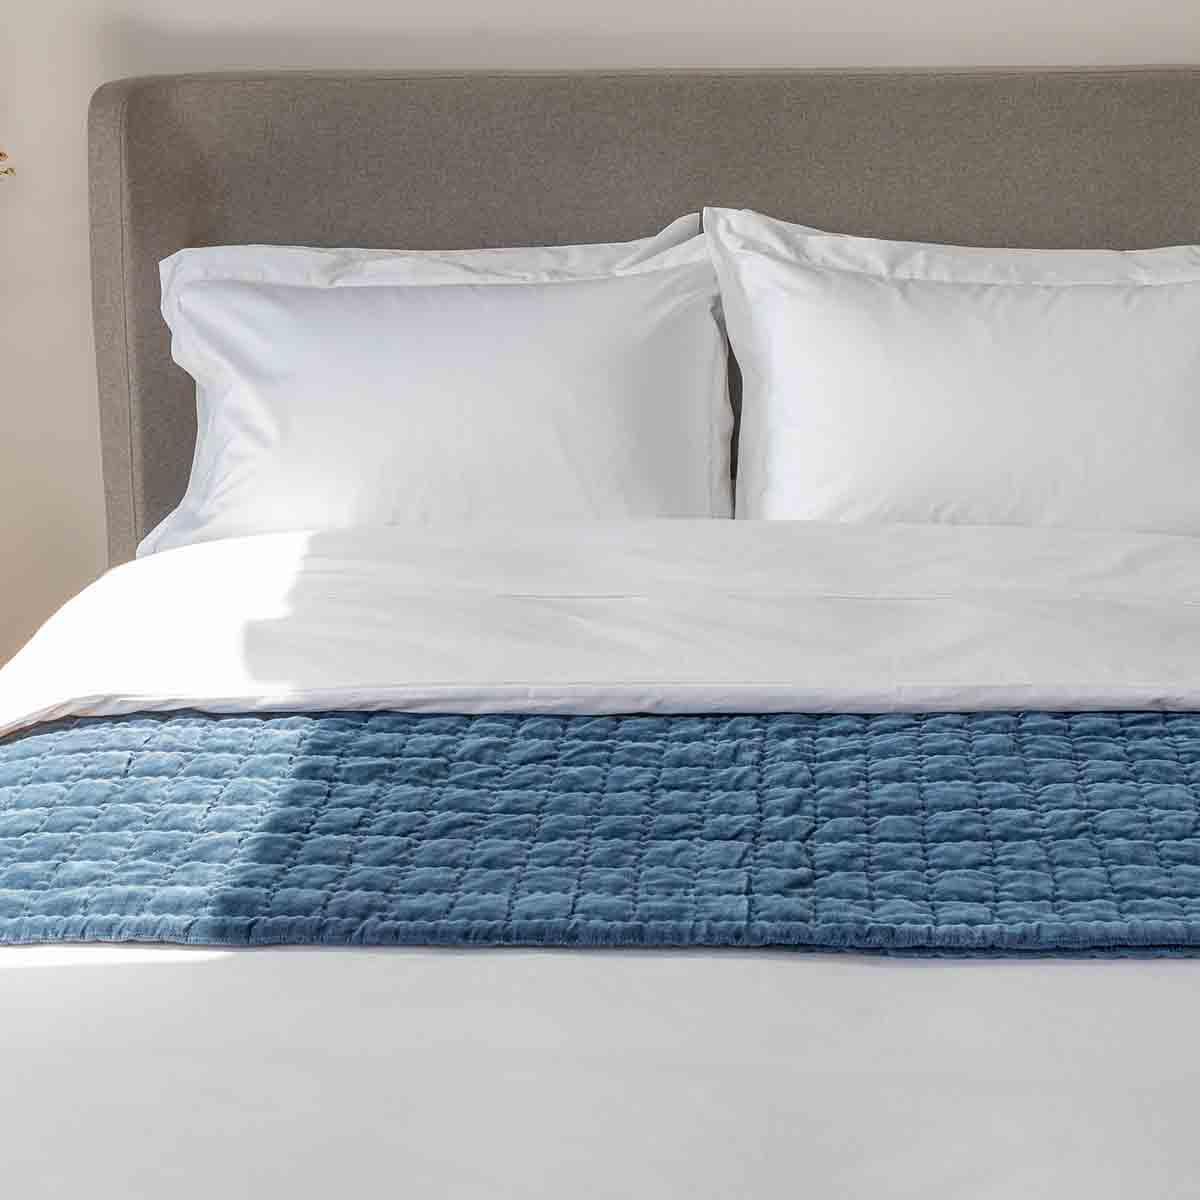 White 1000 Thread Count Supima Cotton Superking Duvet Cover